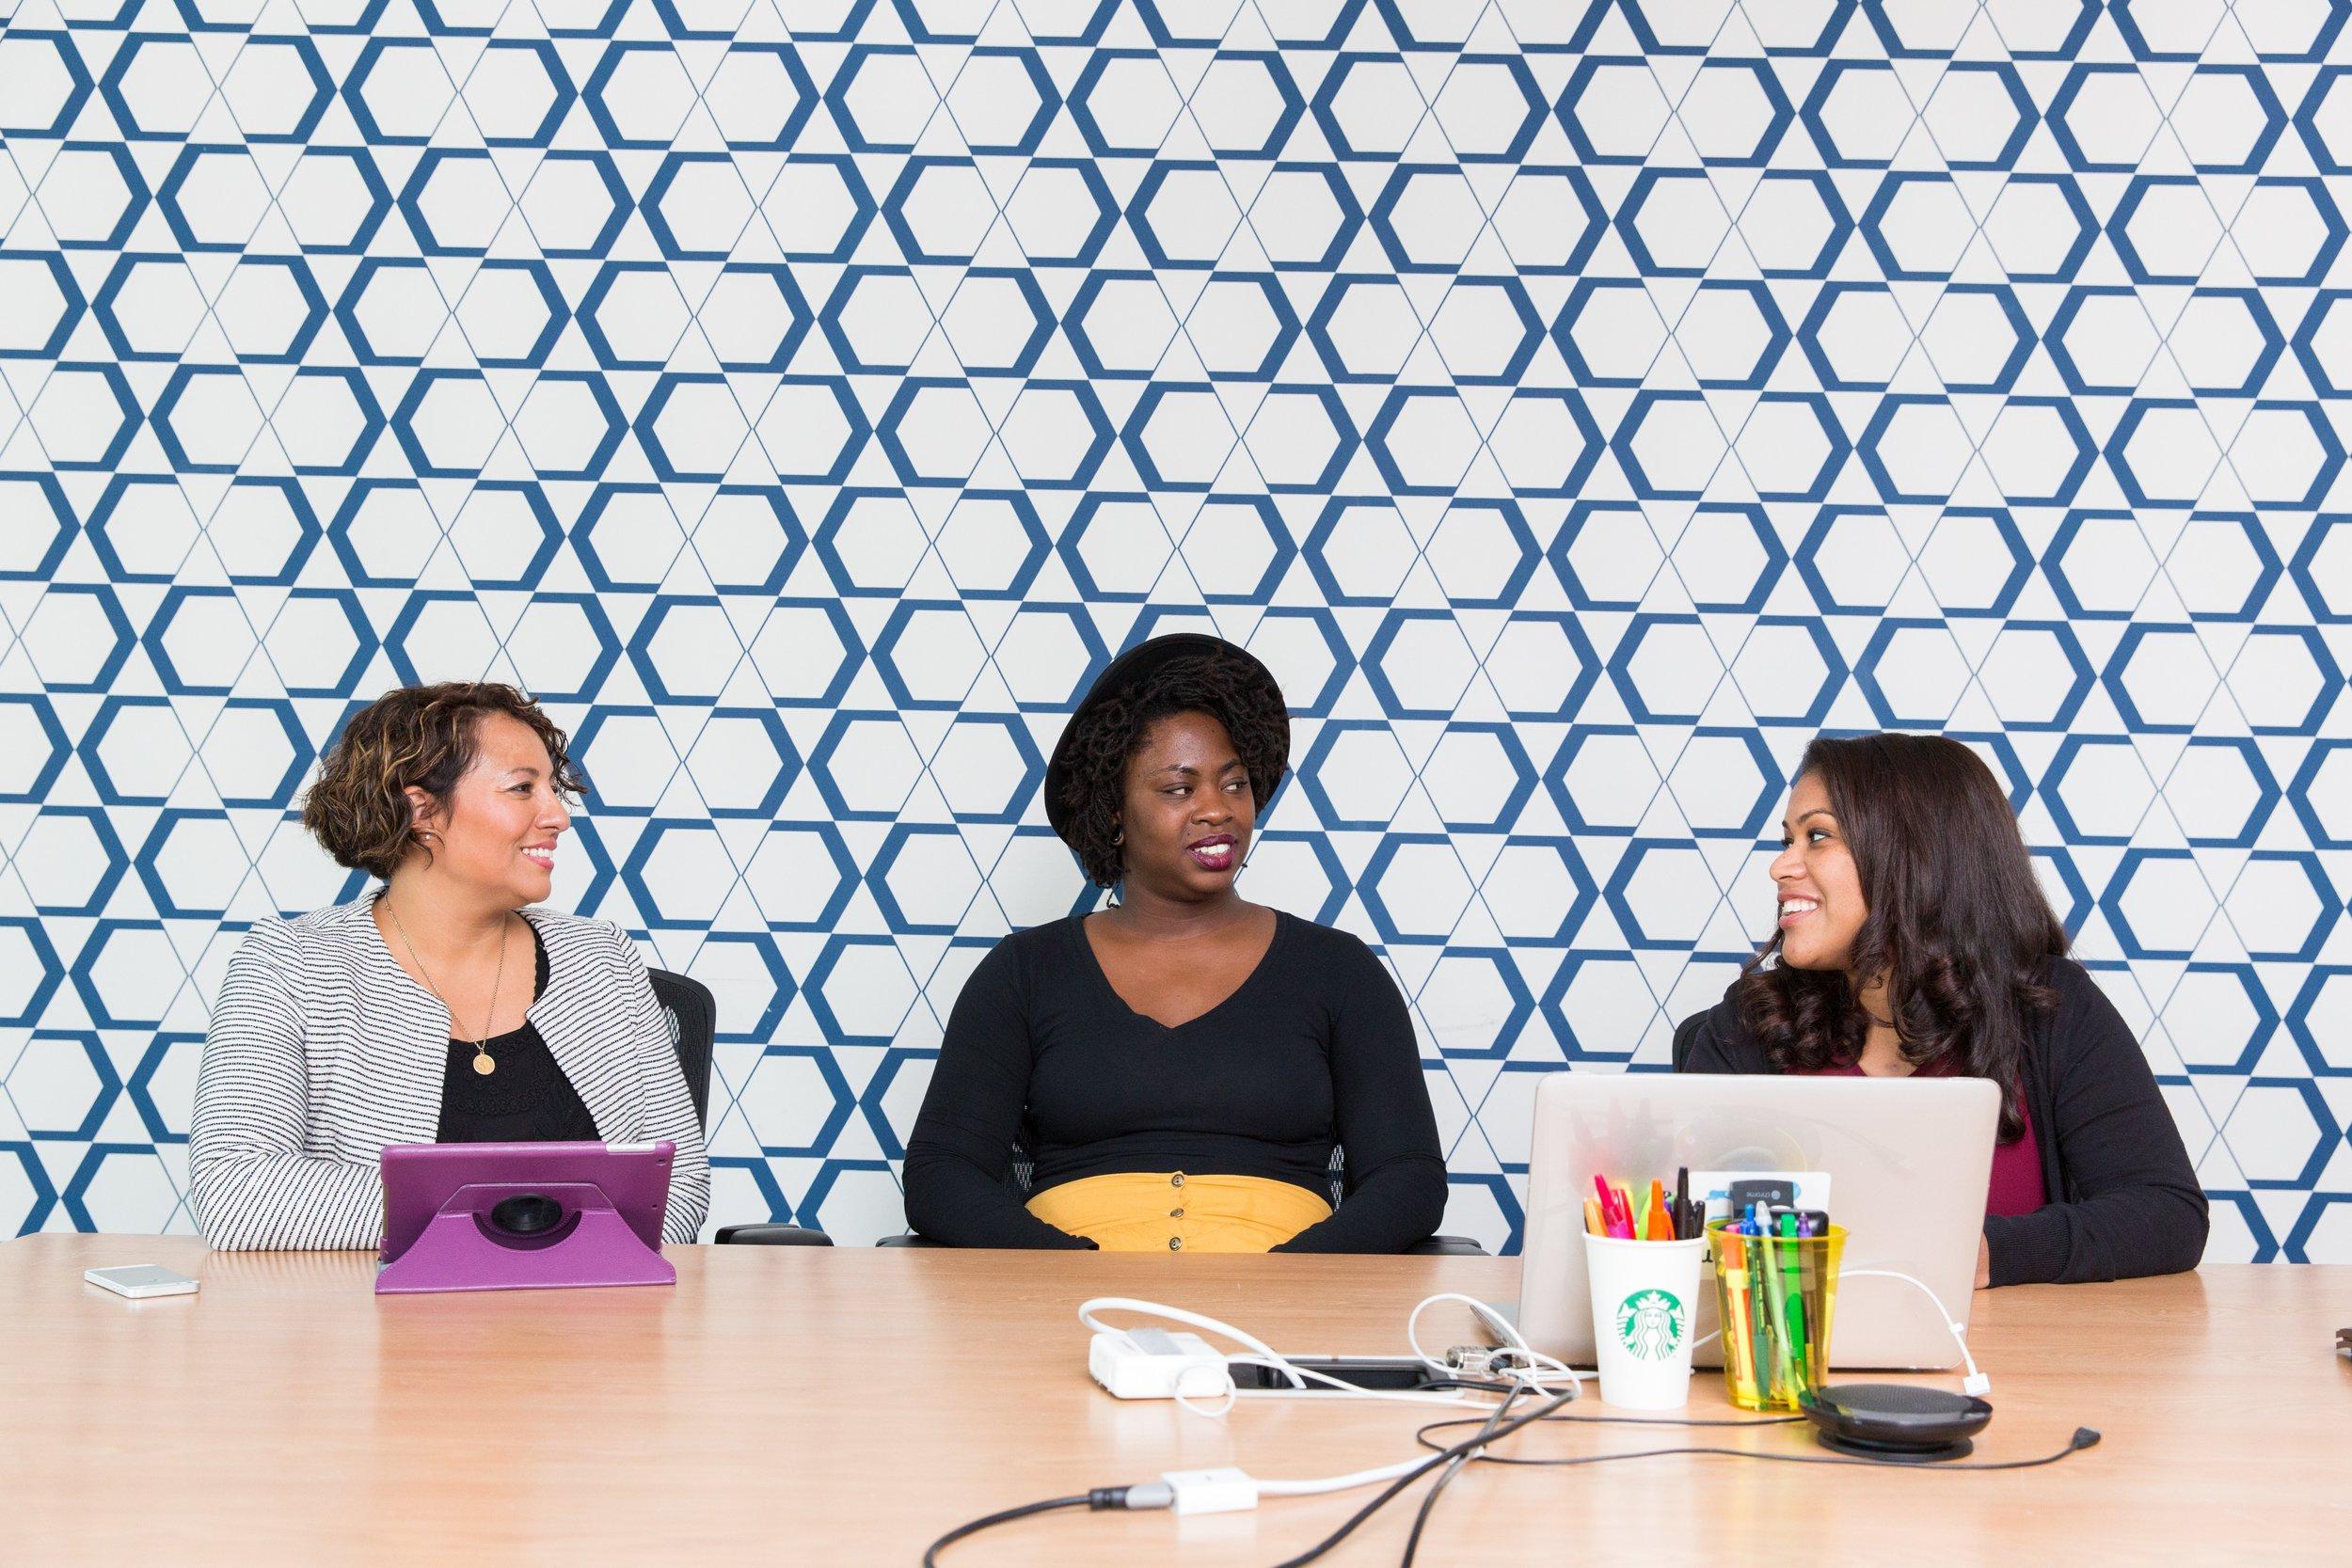 We   inspire   women through real-world start-up stories.